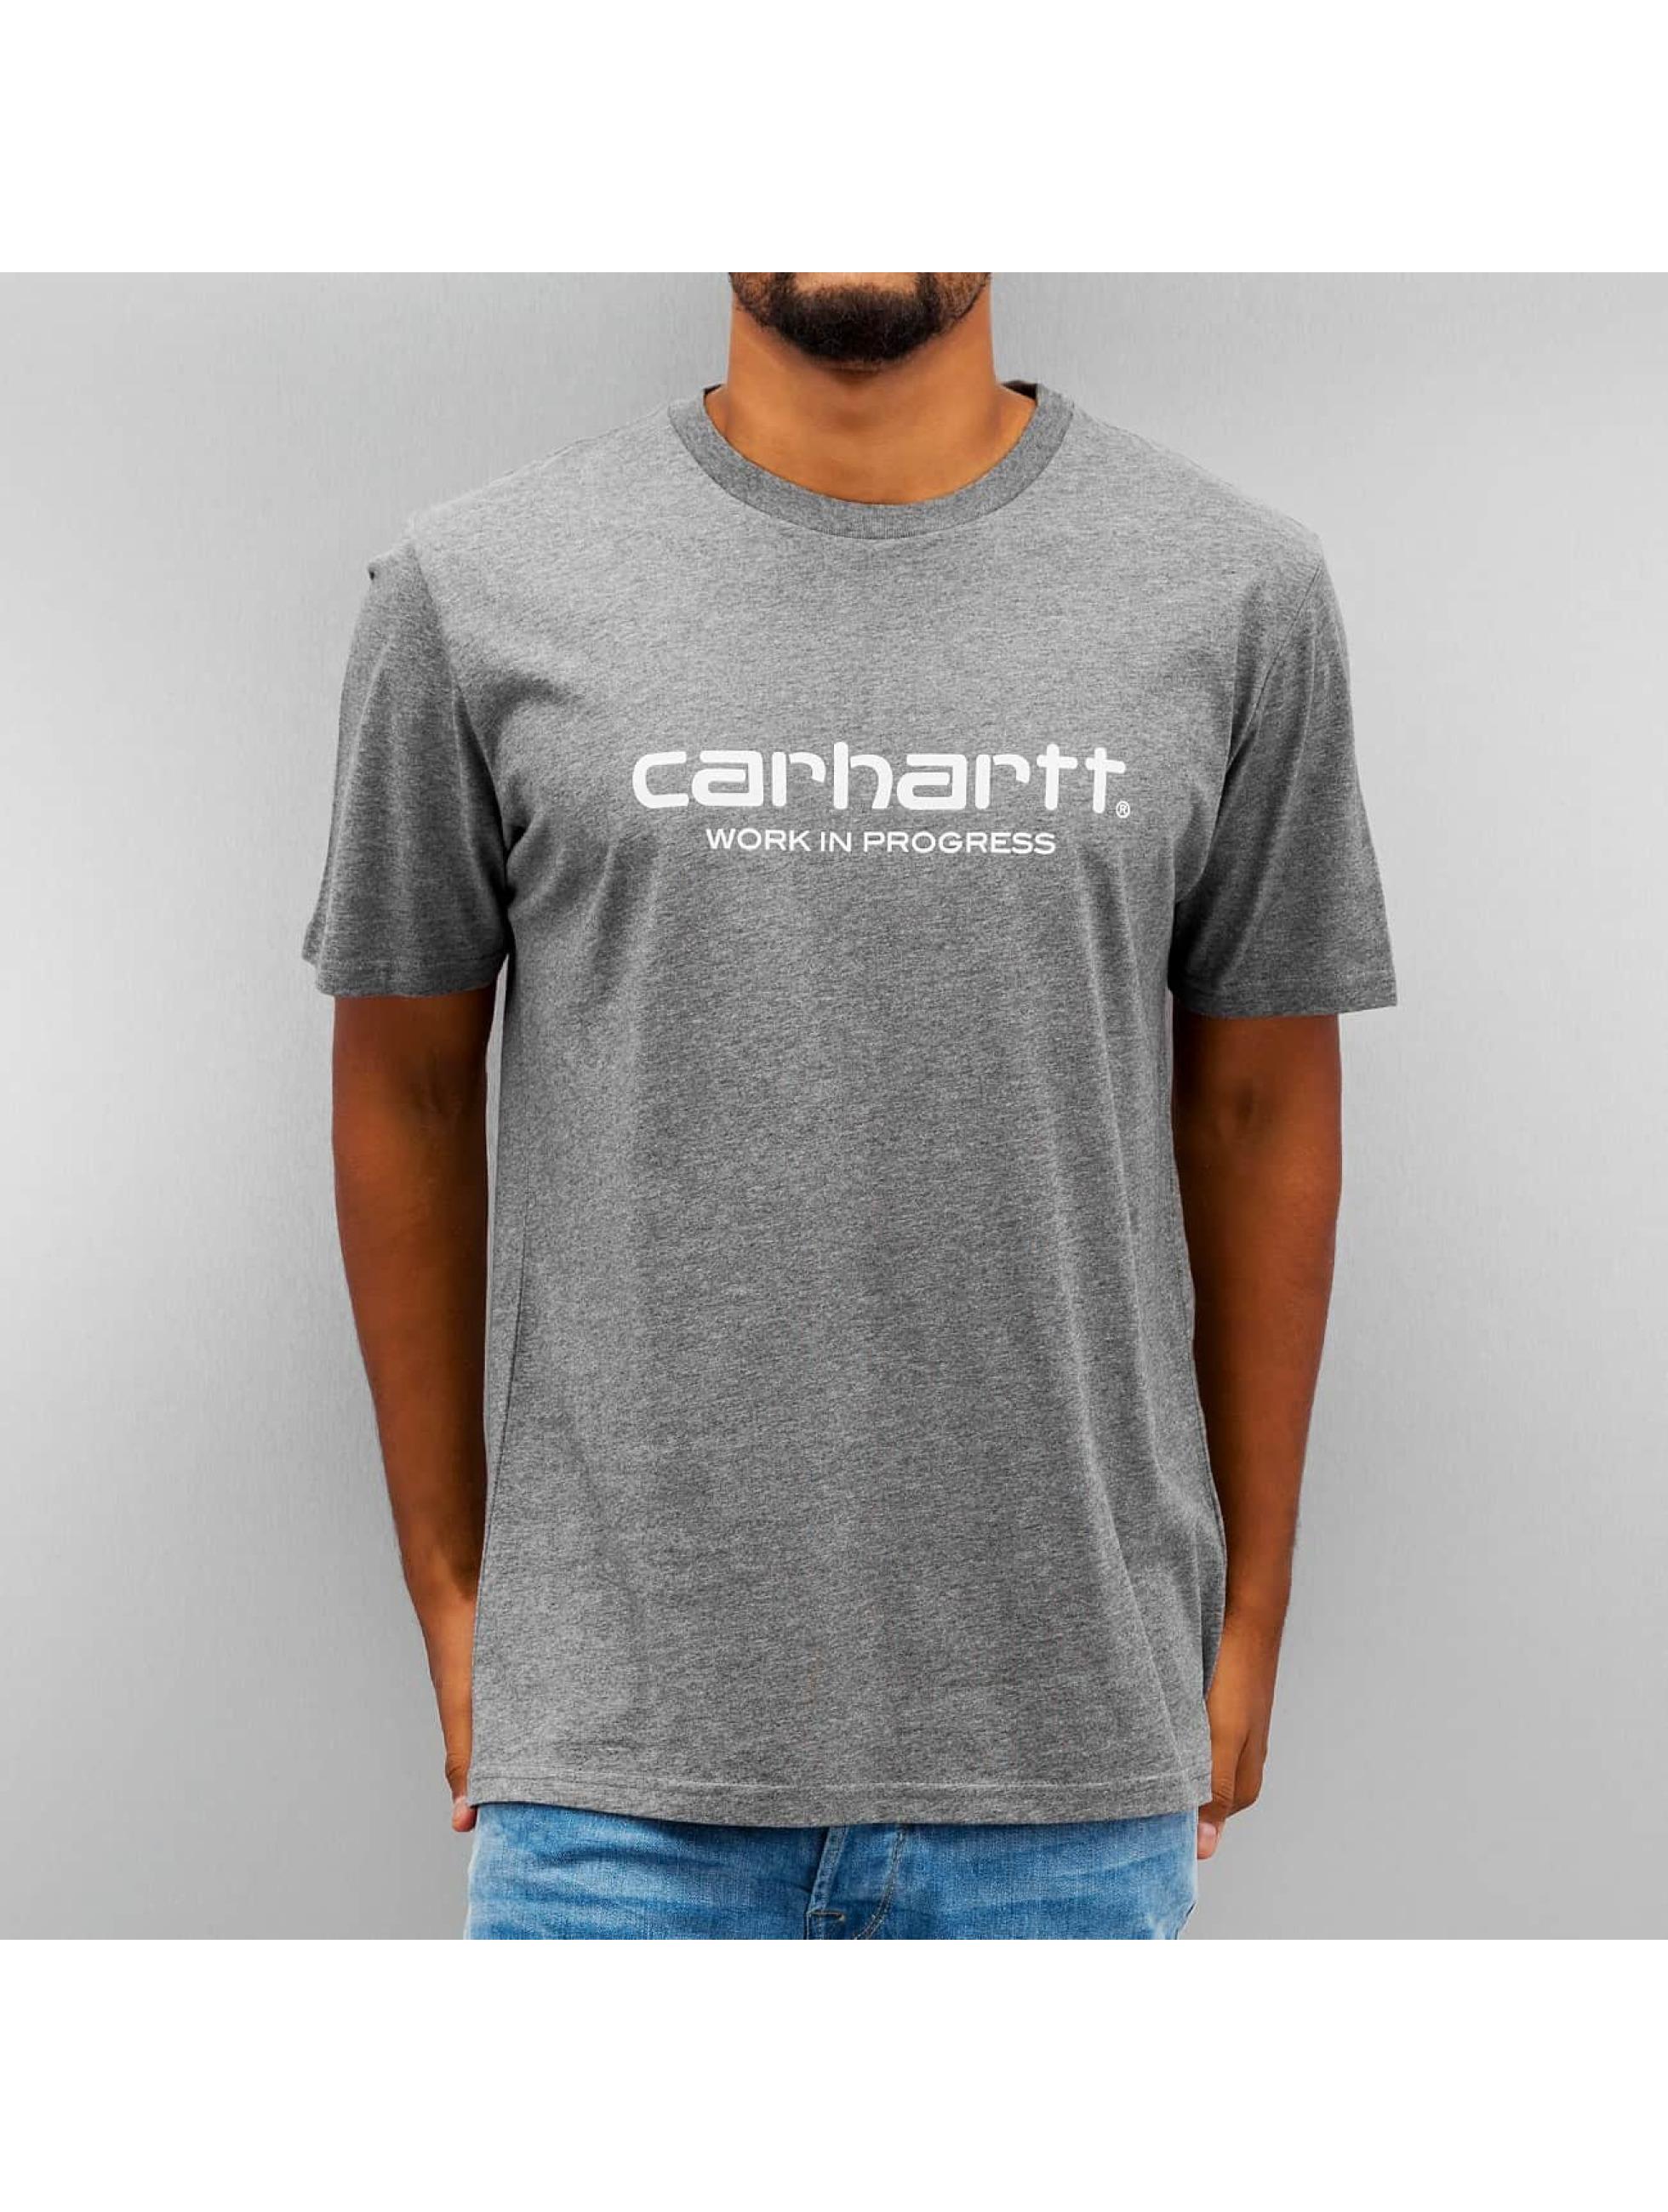 Carhartt WIP T-paidat S/S Wip Script harmaa